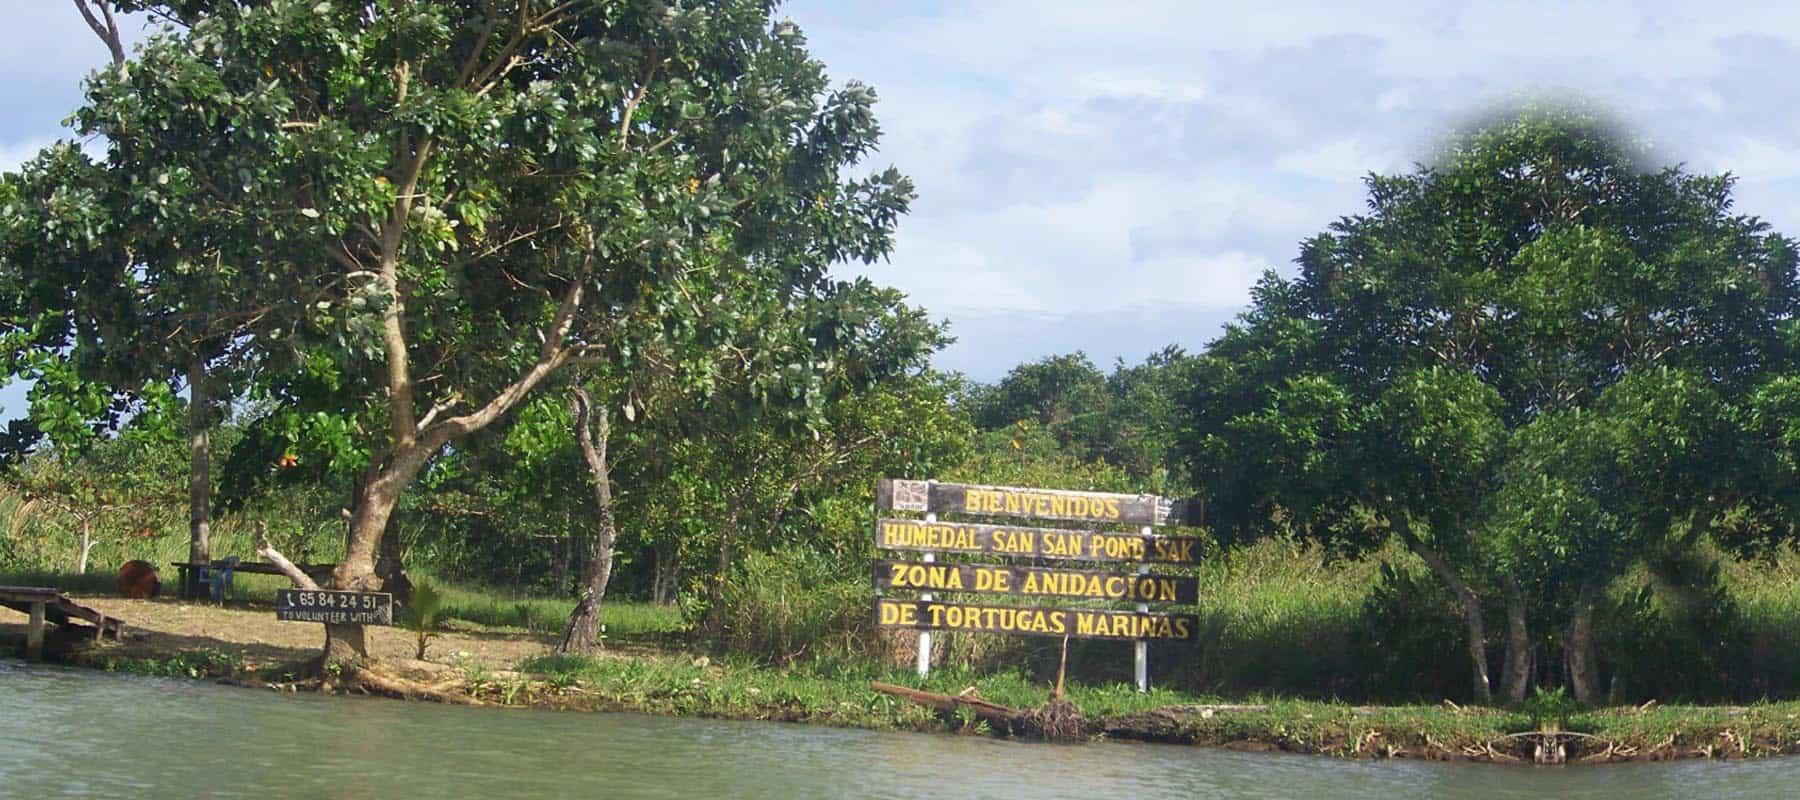 San San Pond Sak Manatee Tour